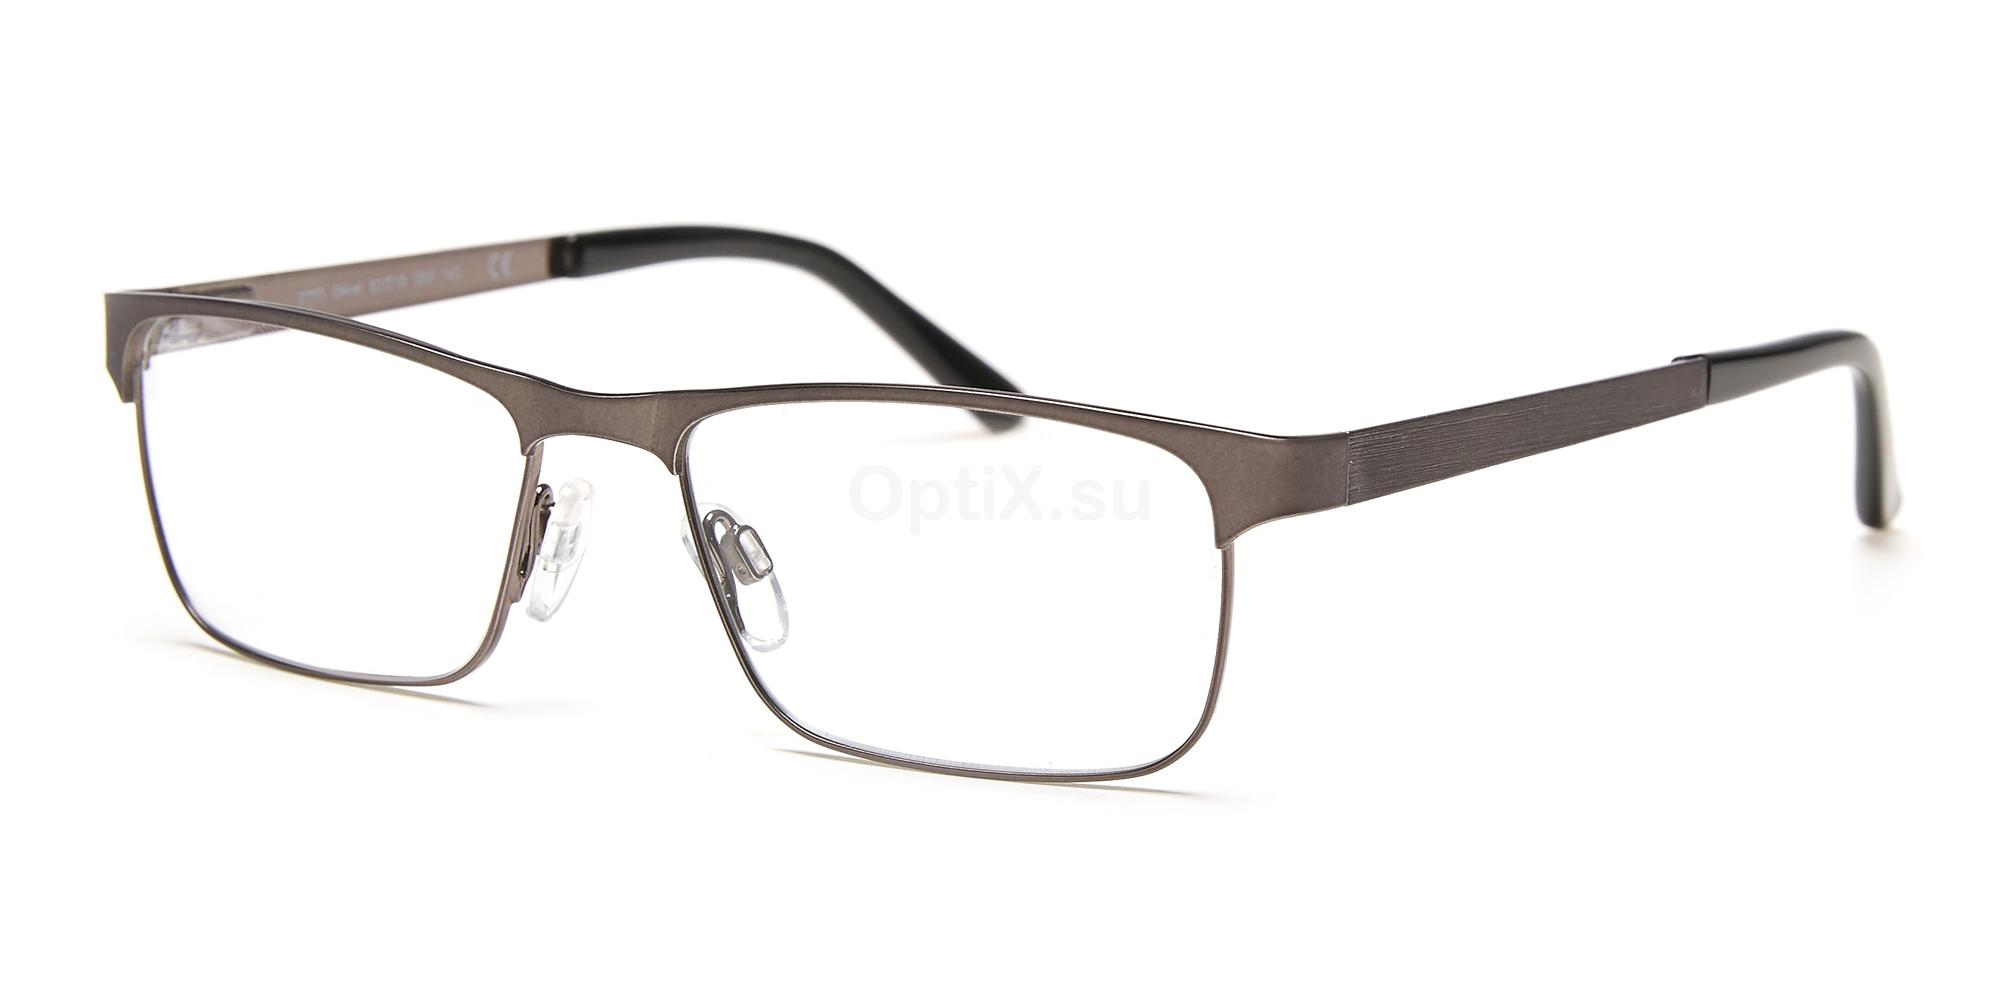 033 SK2780 SEKEL Glasses, Skaga